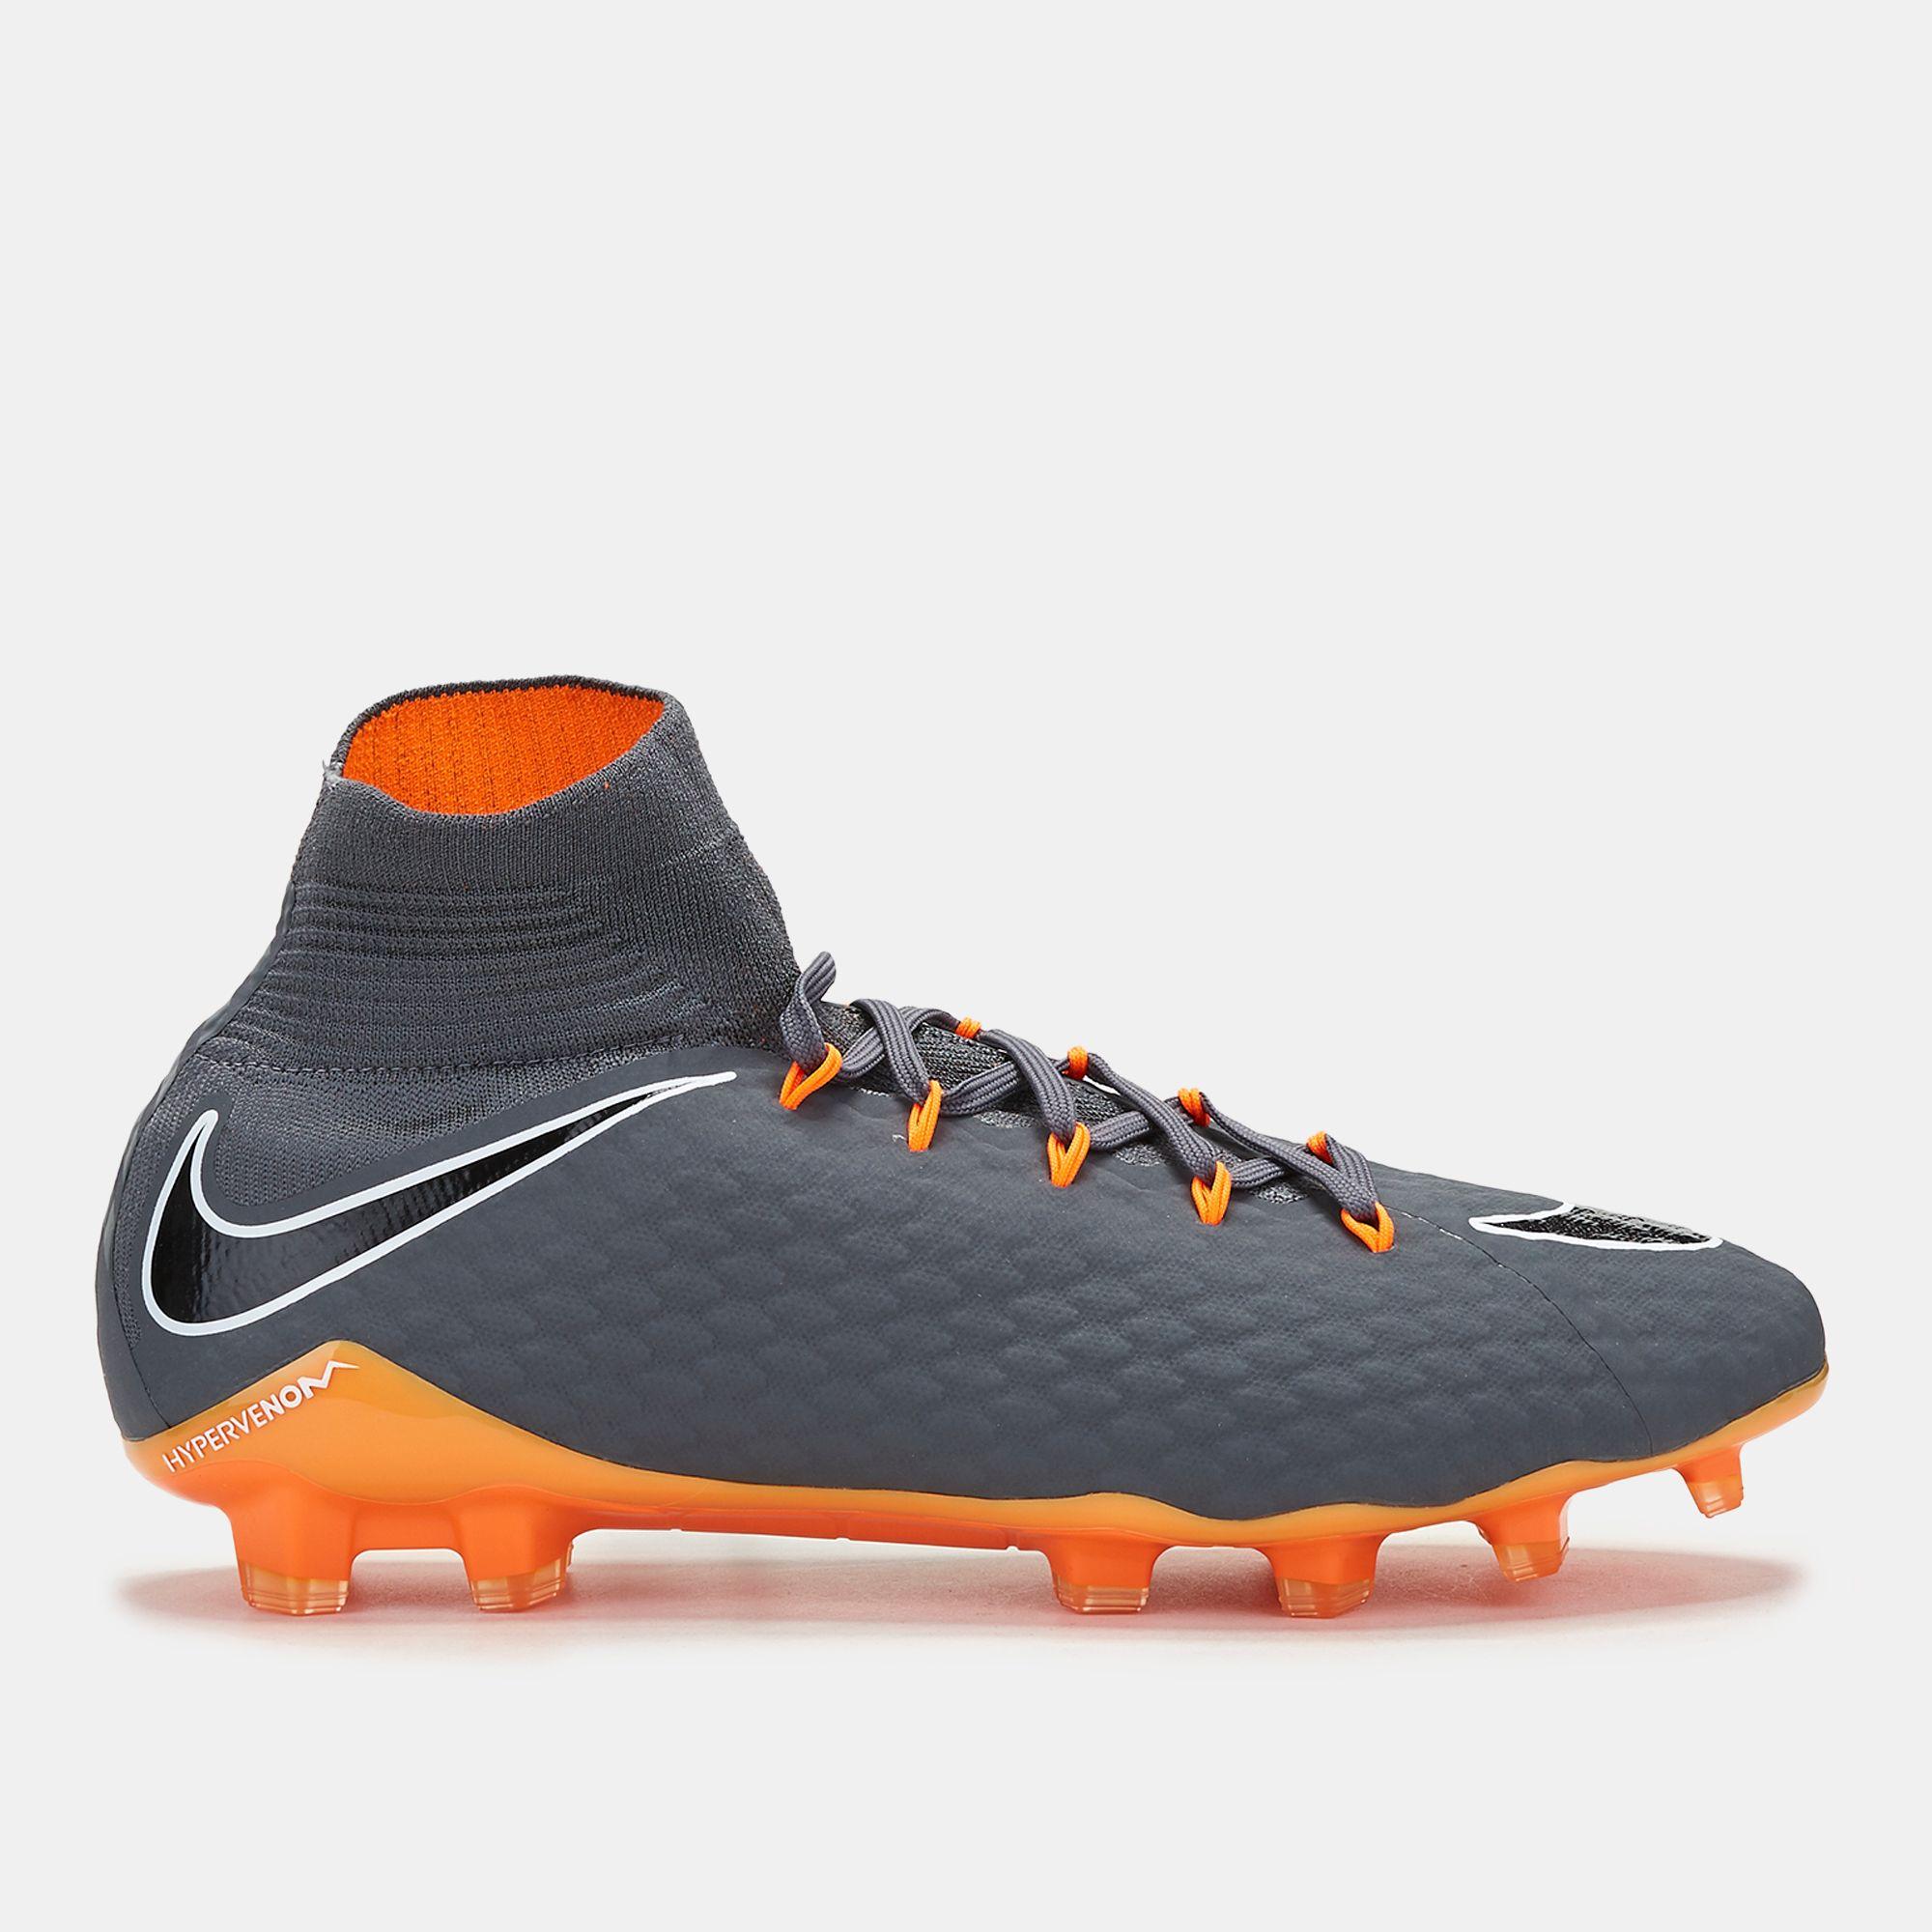 1c92cc469 ... ebay nike hypervenom phantom 3 pro dynamic fit fg football shoe e53cf  6573e